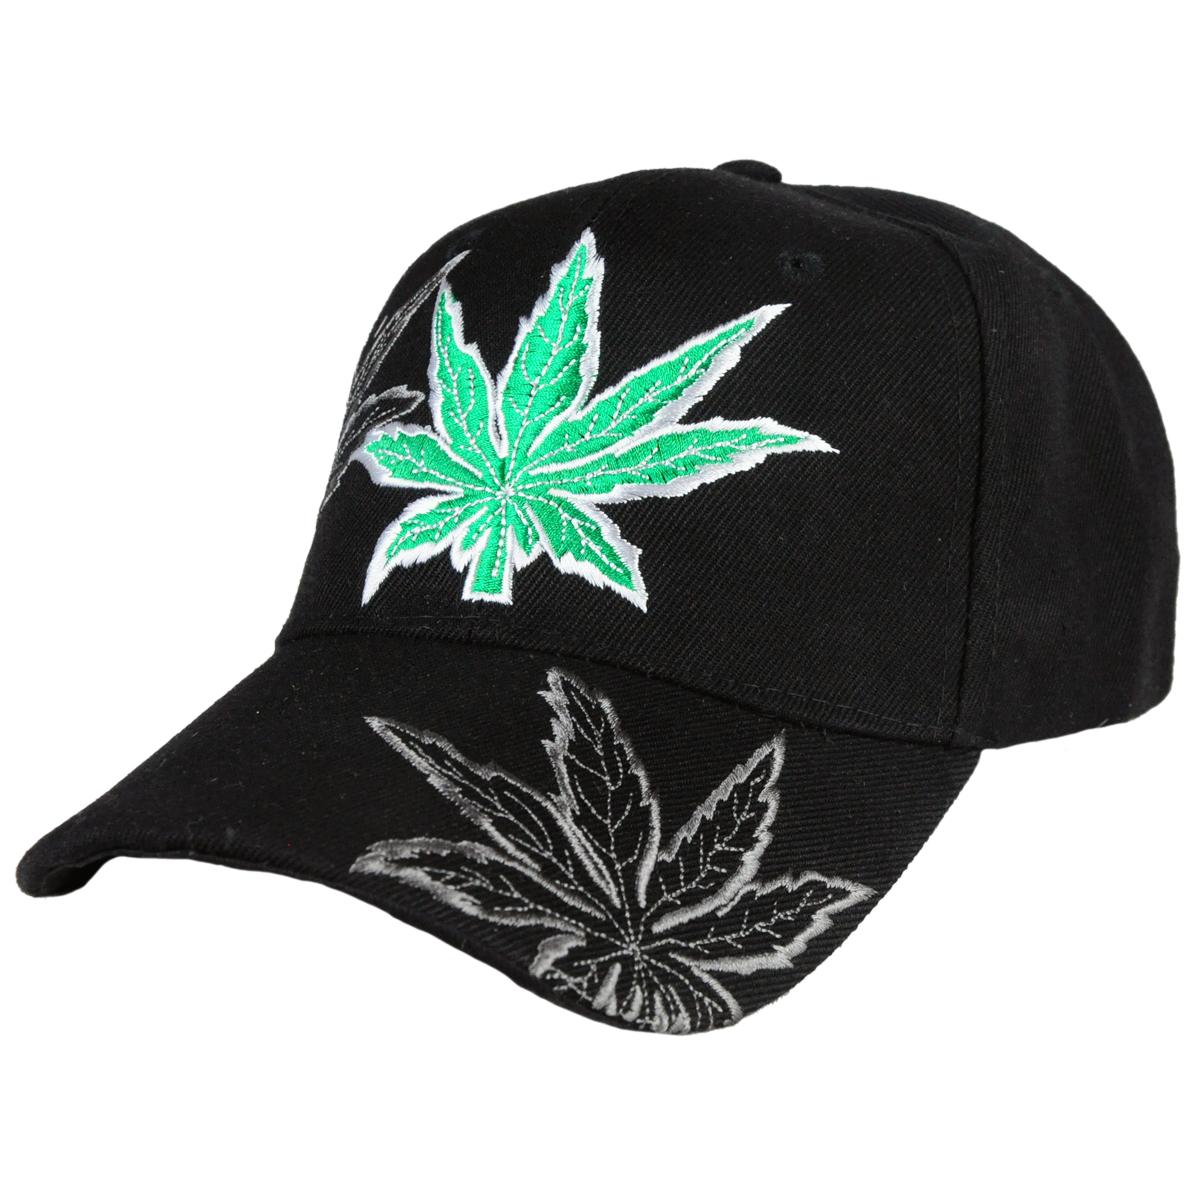 89bc13339ee Embroidered Weed Leaf Cap